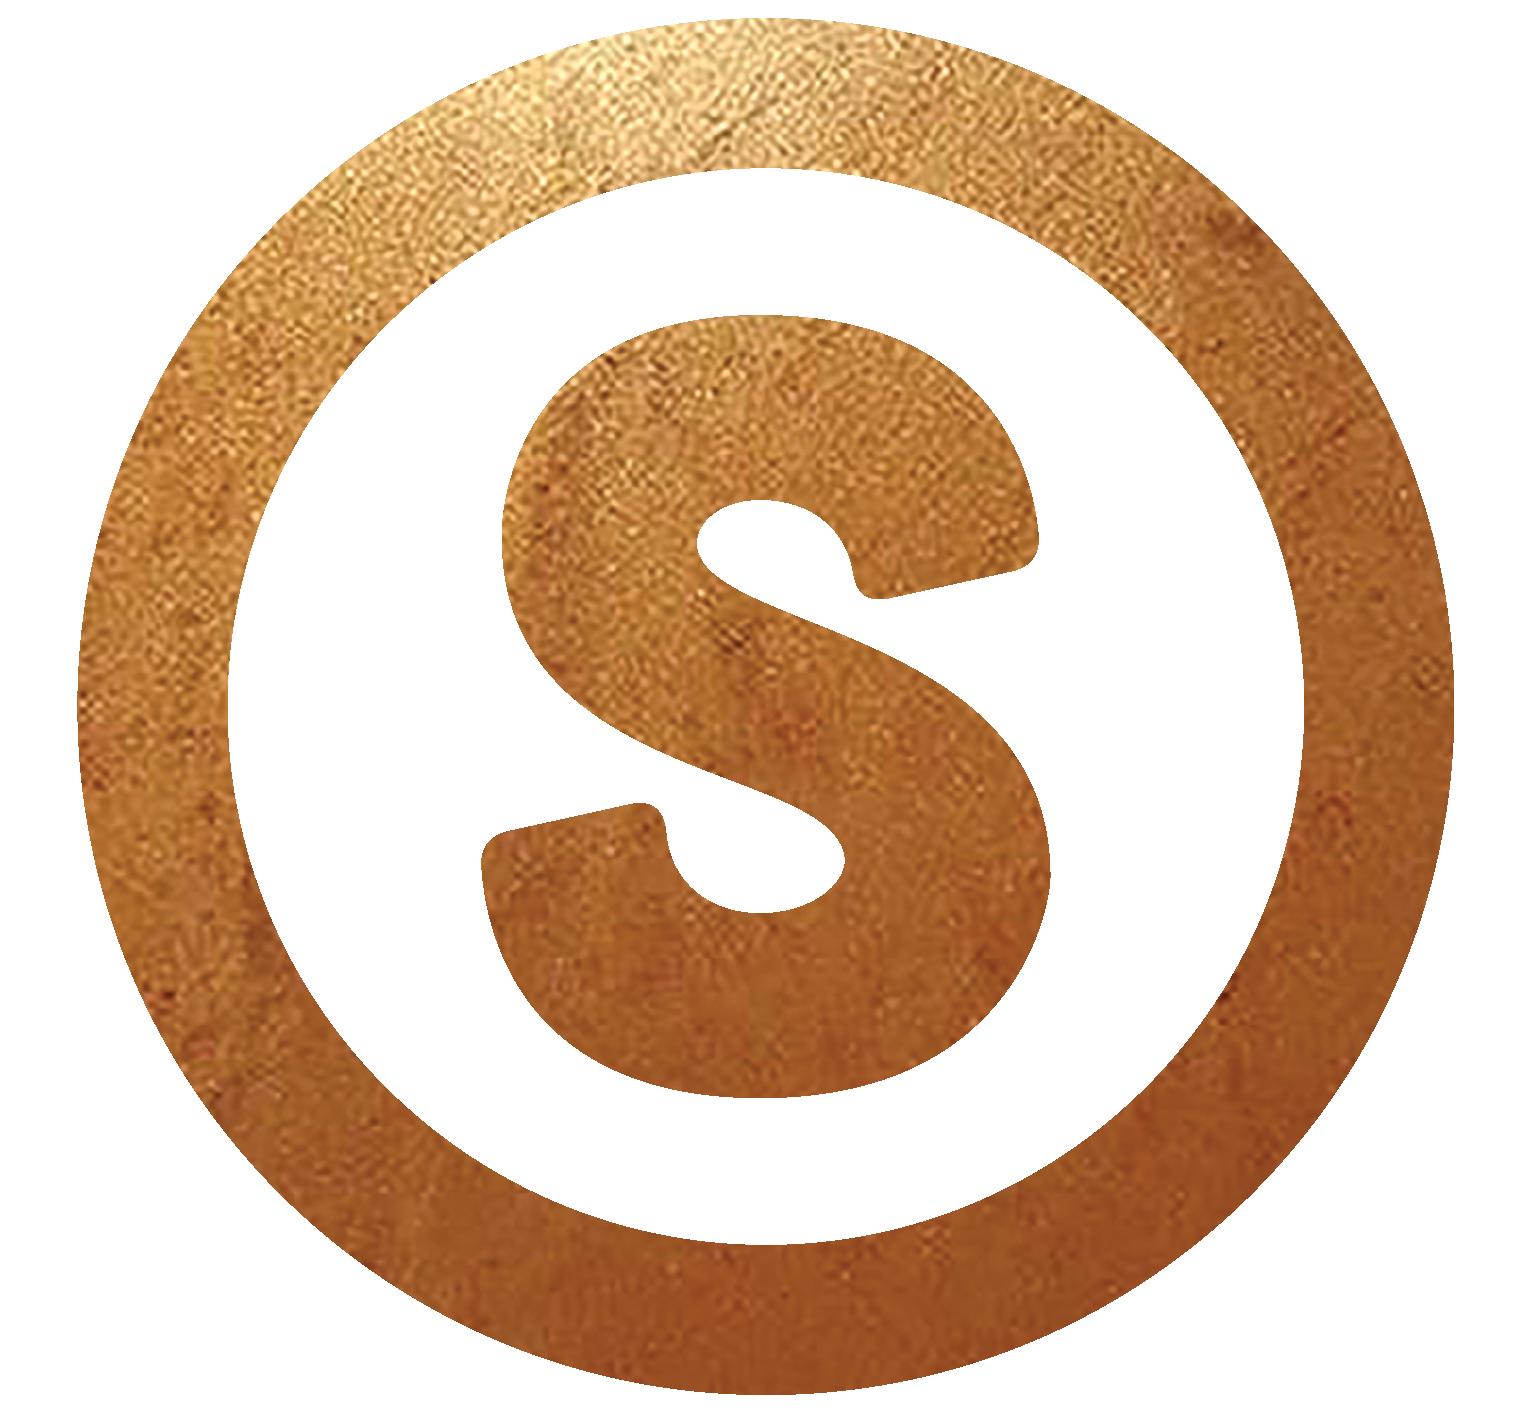 Salvage_logo-08.png